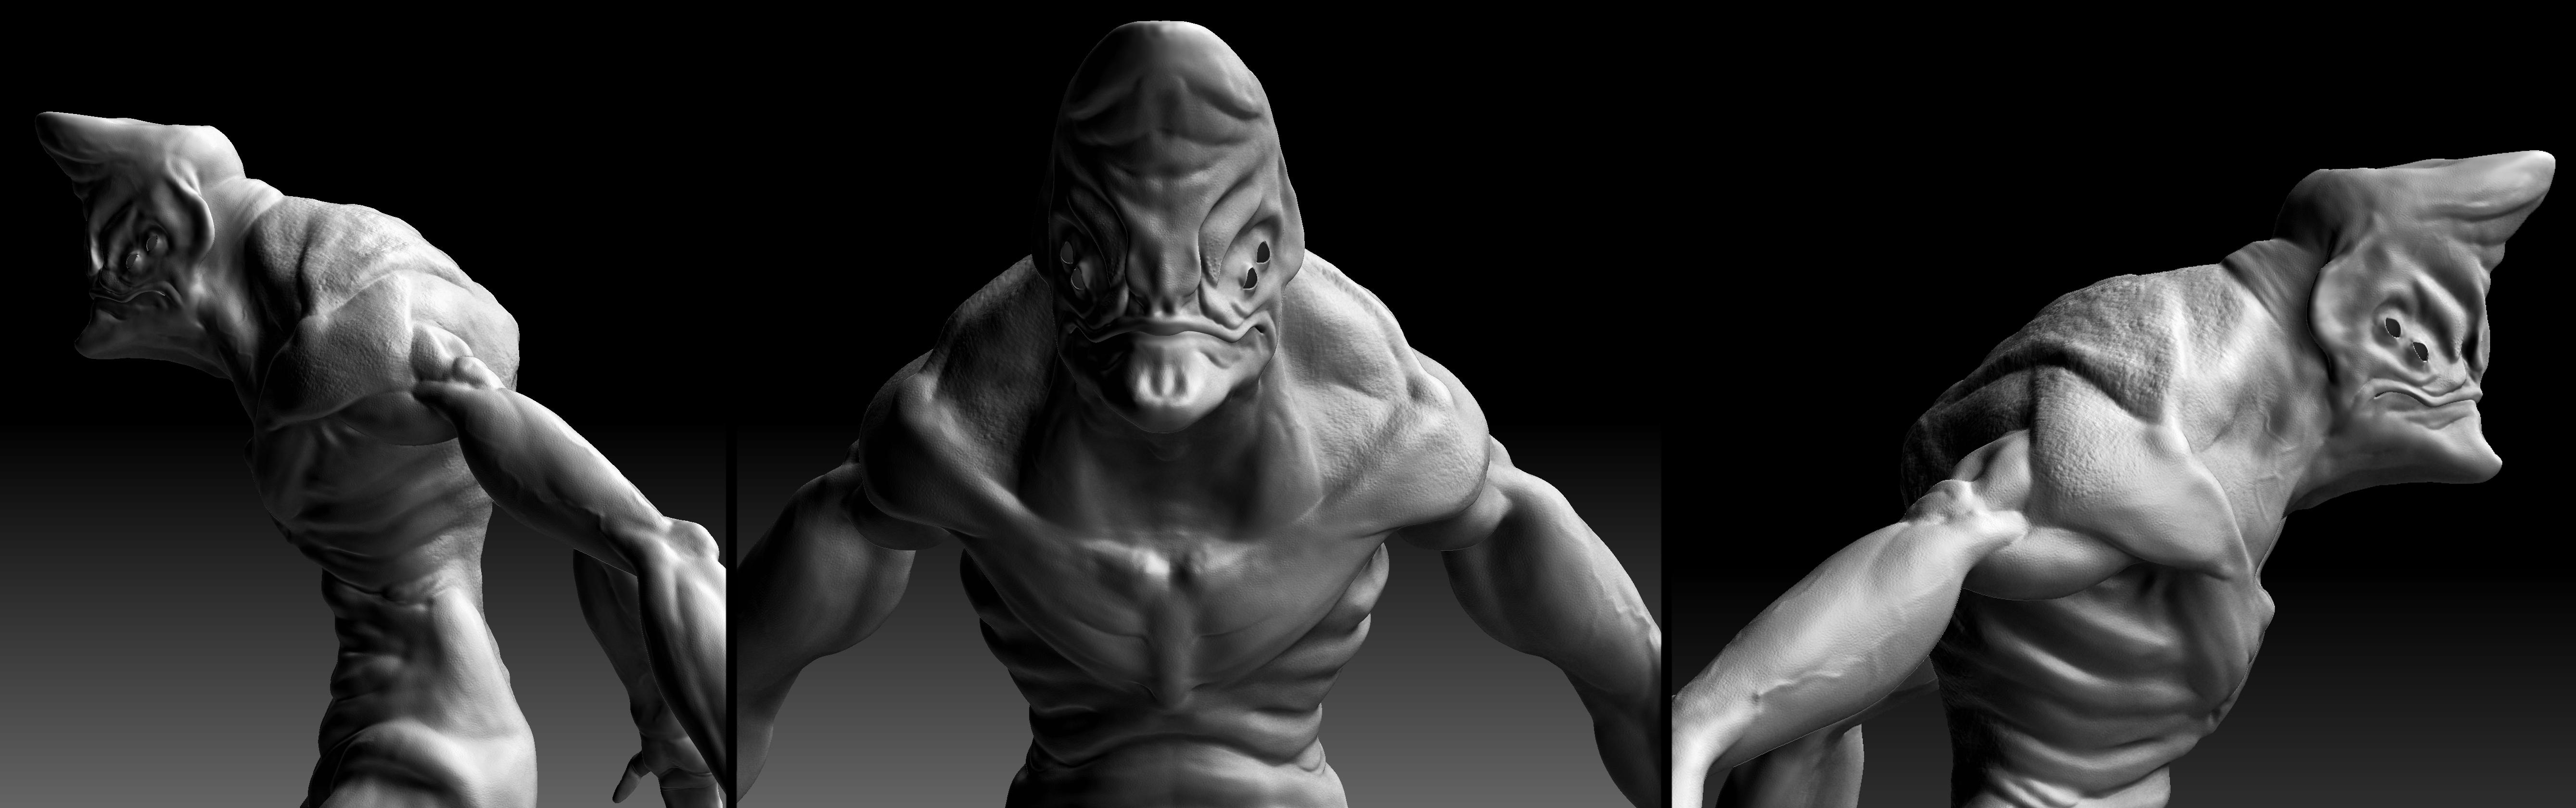 alien_sculpt_skin_detail_by_lorenzomelizza-d79e7hb.jpg